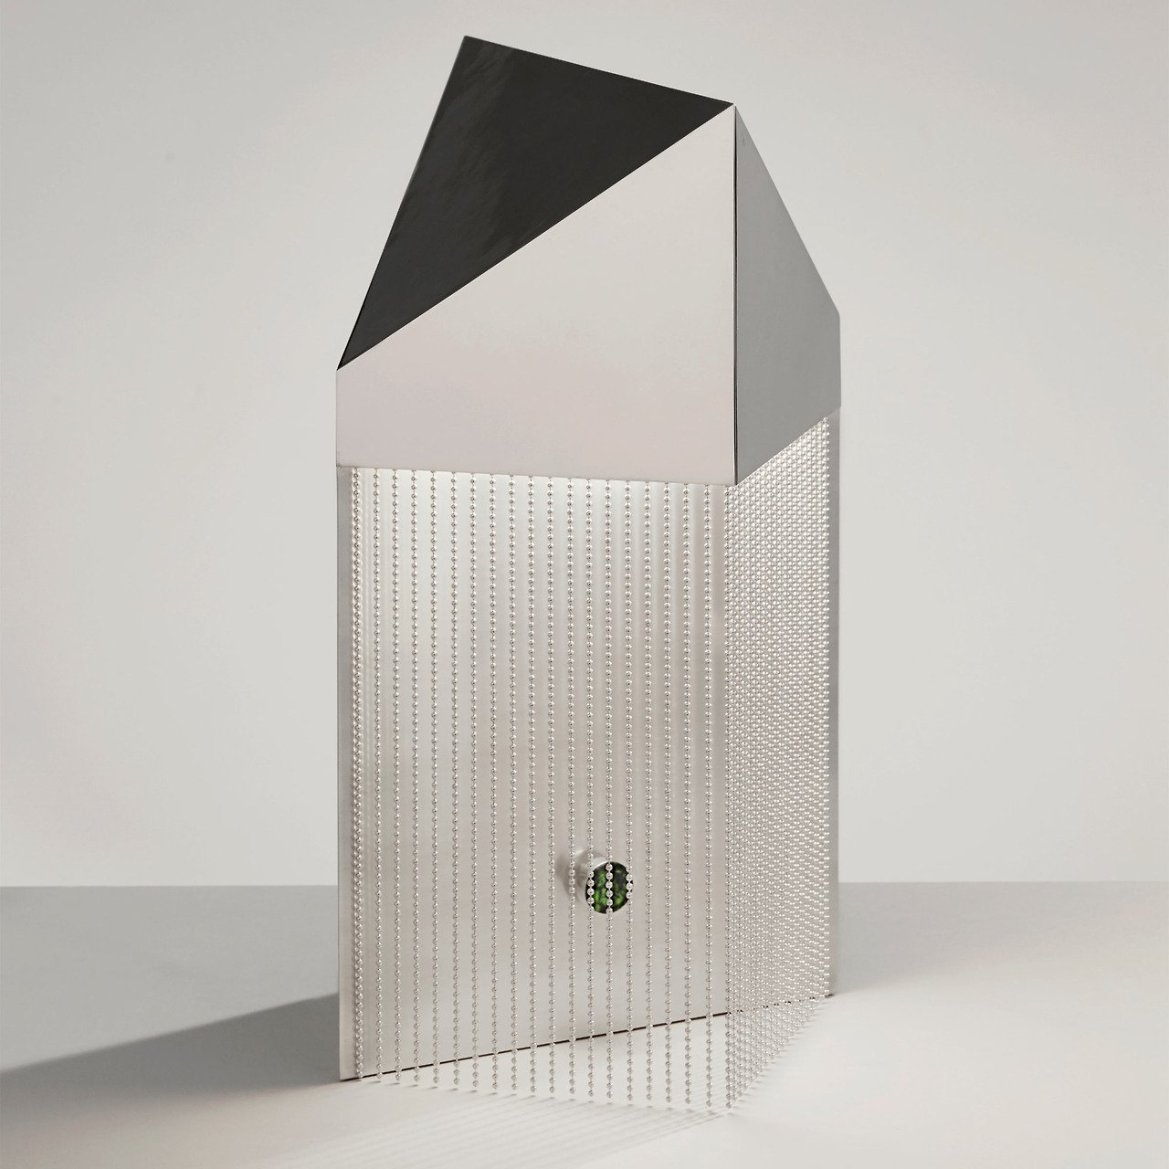 Studio Pelle design, New York